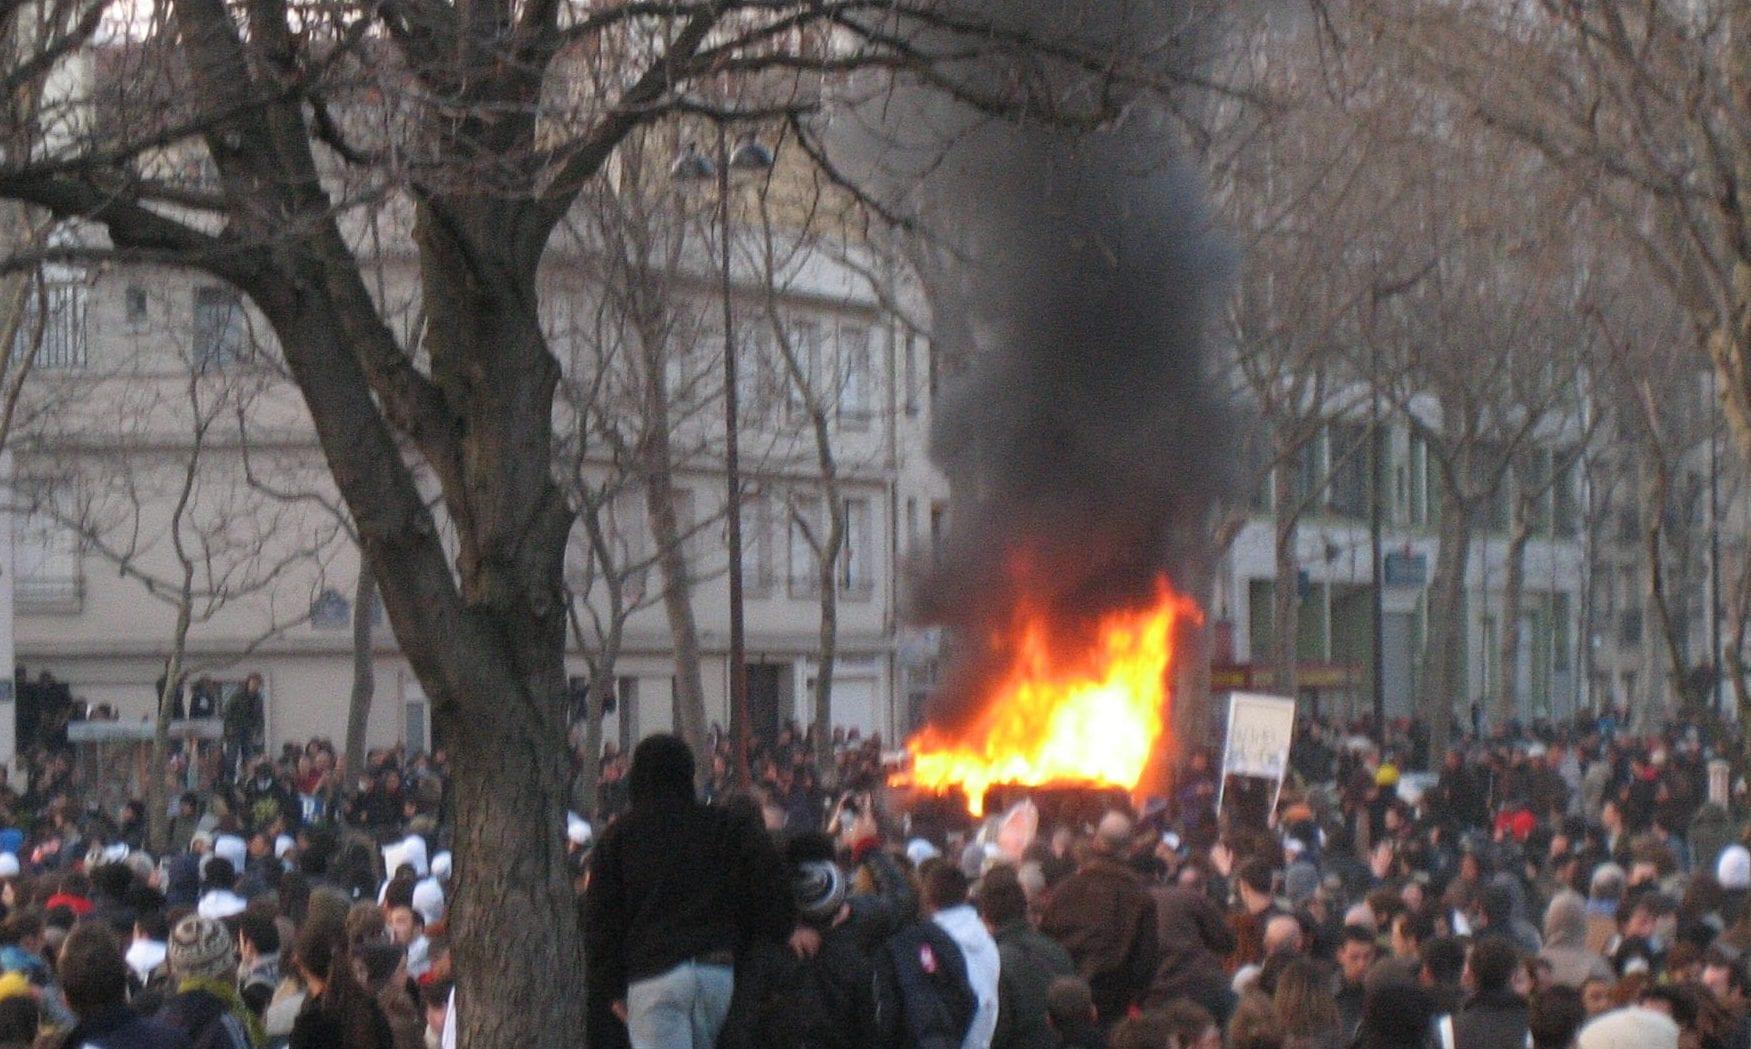 Demo / Auto brennt